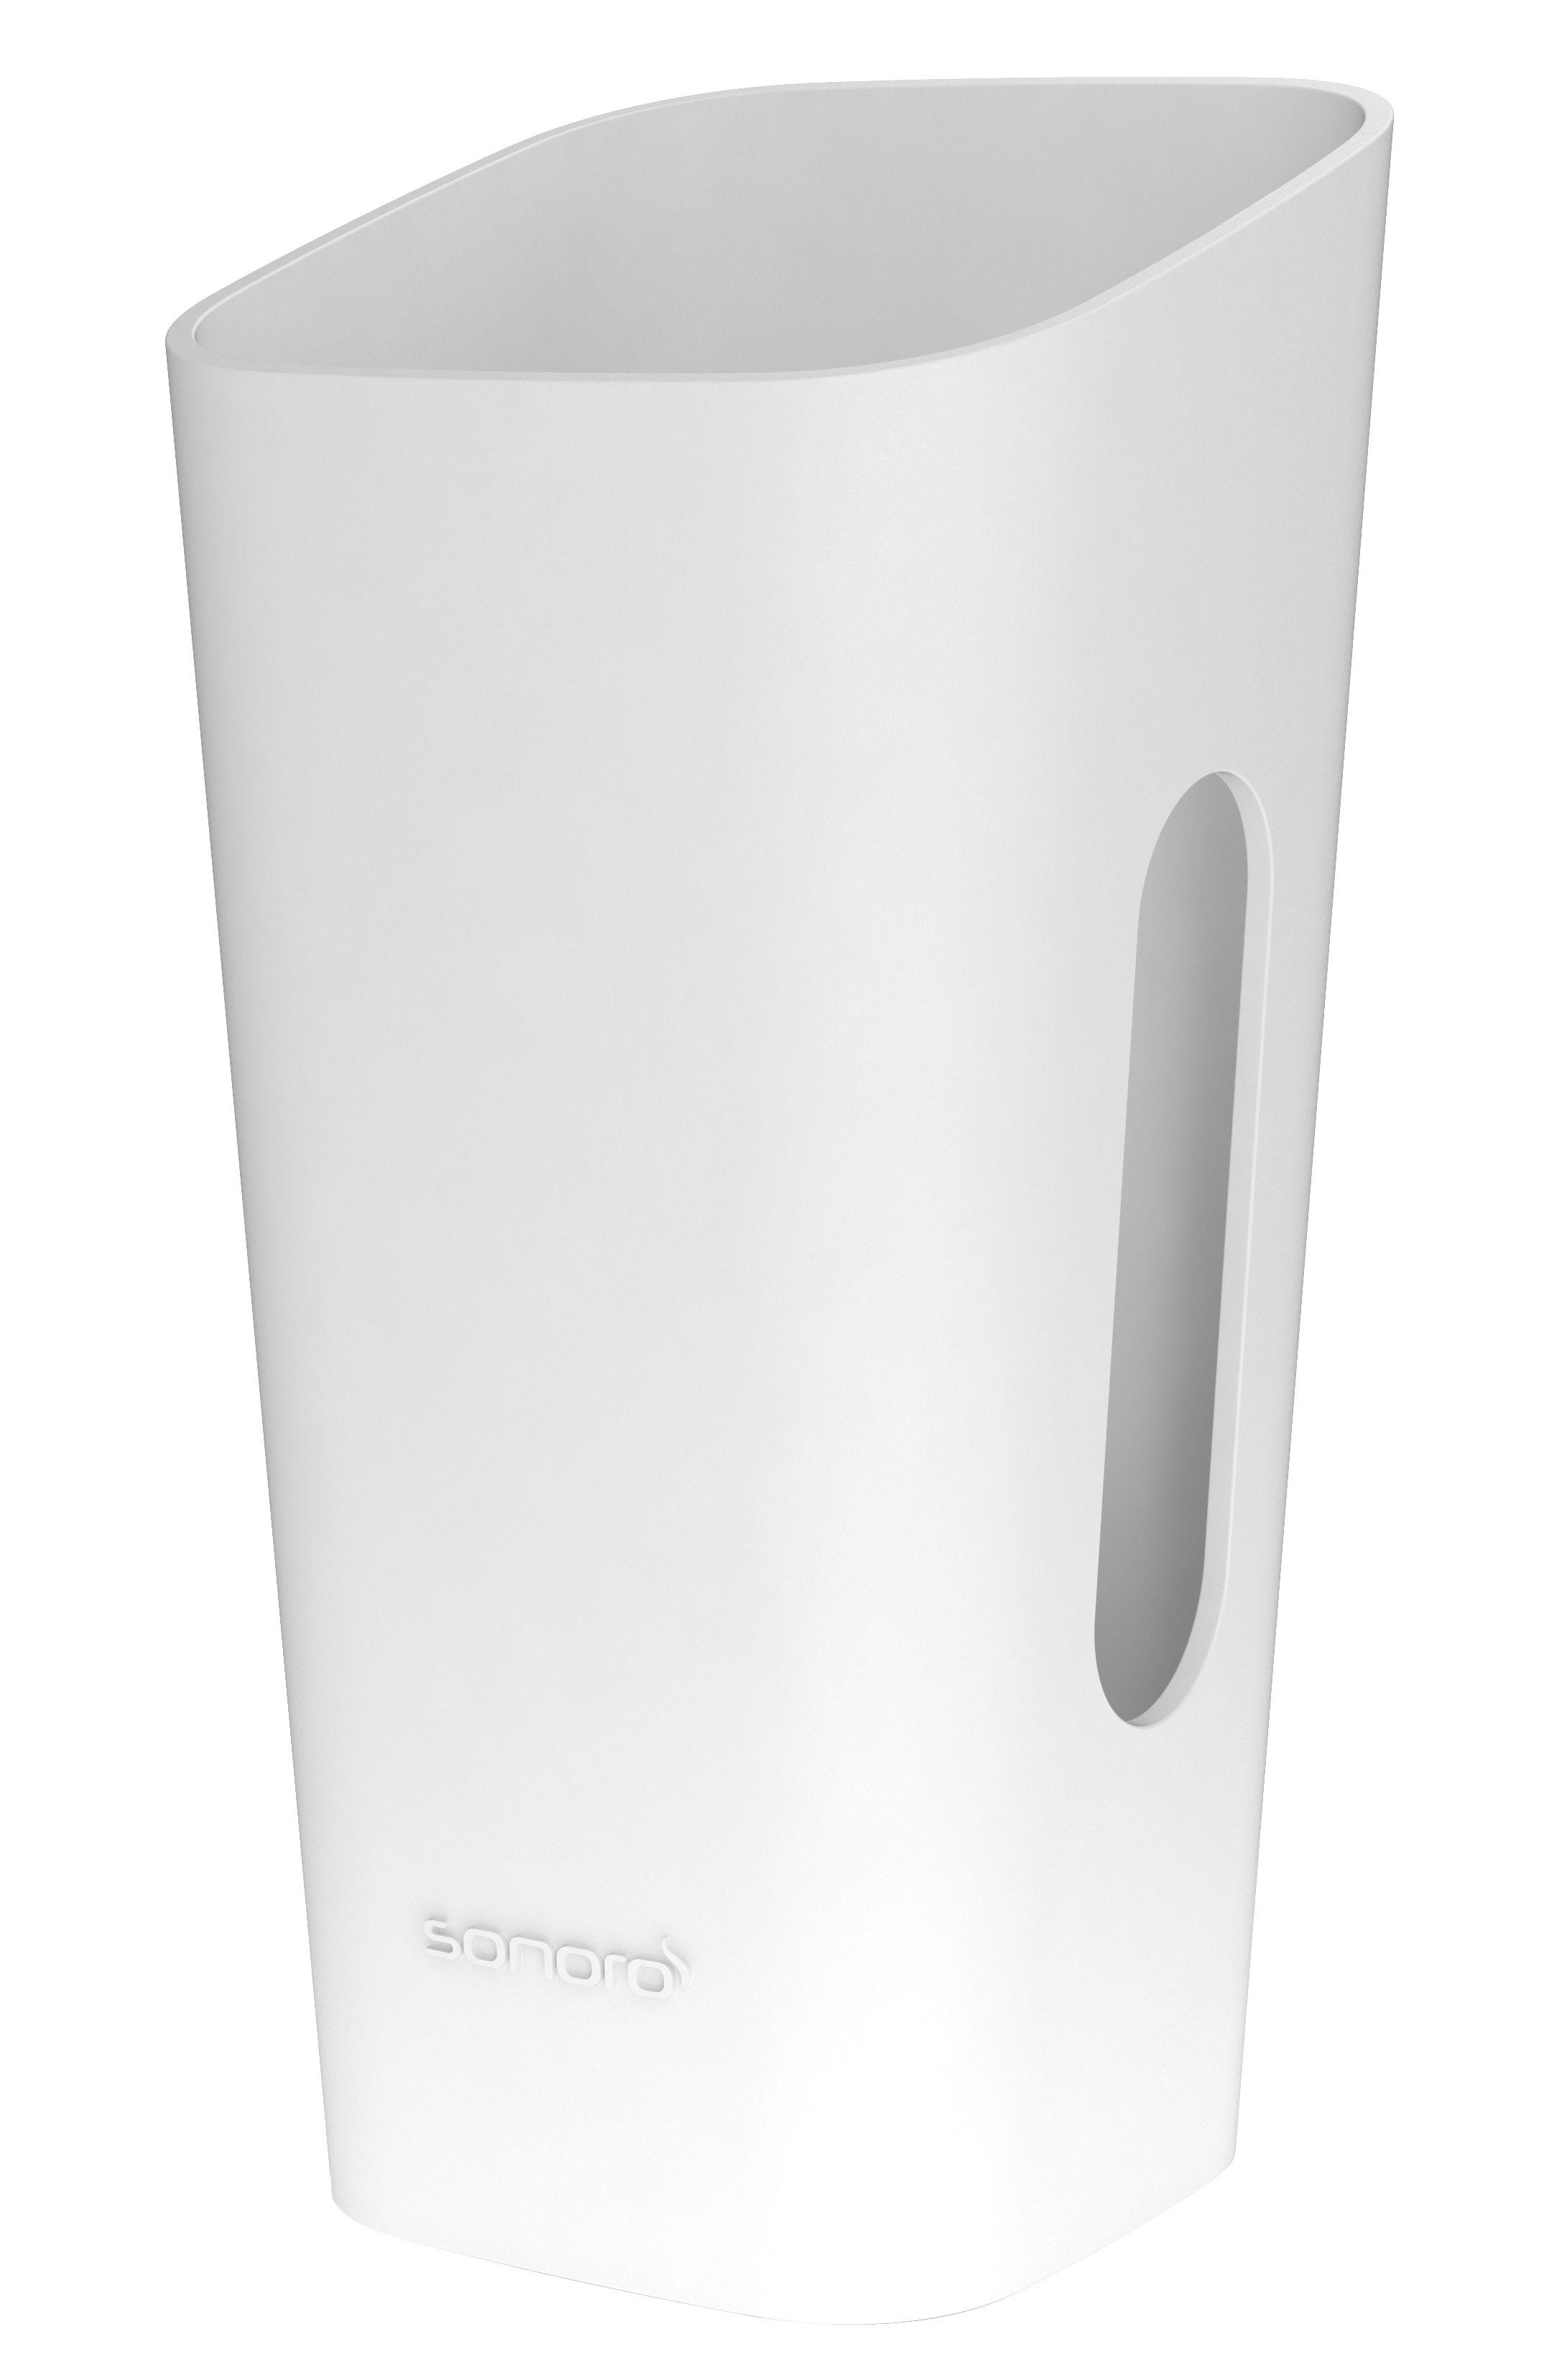 Accessories - Alarm Clocks & Travel Radios - Skin Cover by Sonoro - White / Rubber - Rubber